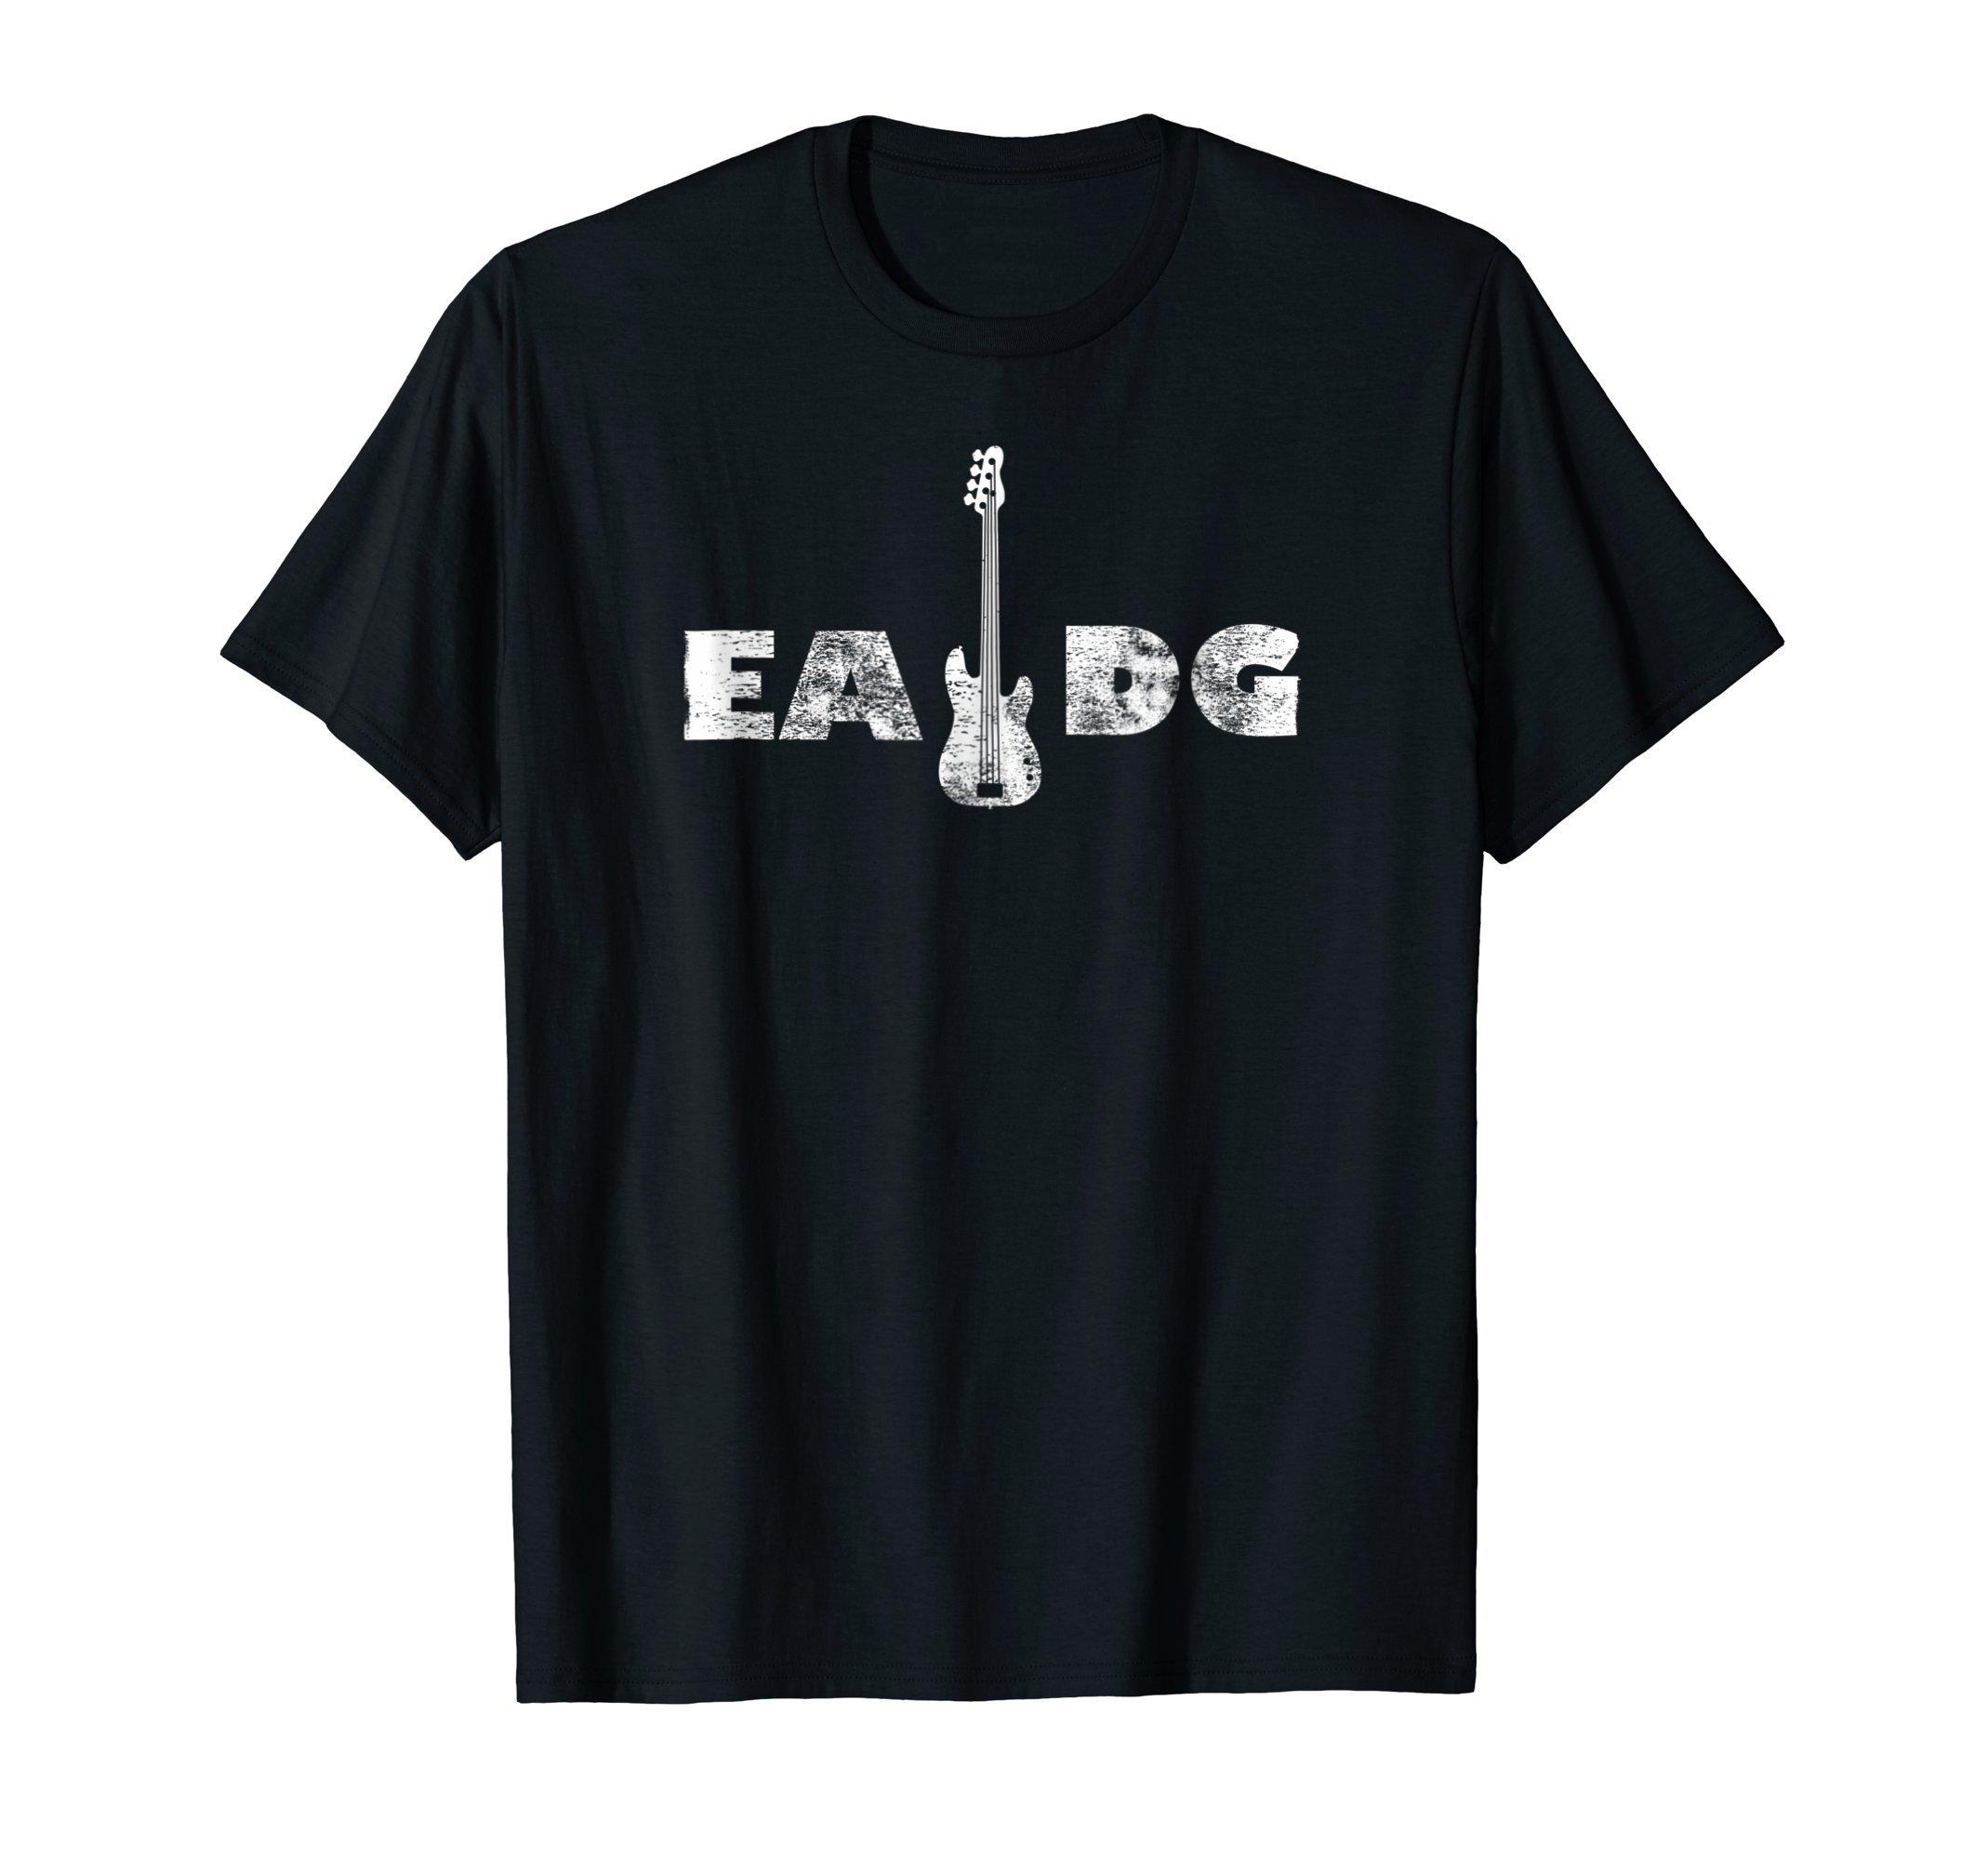 Cool Electric Bass EADG Guitar Rock Music Player Gift Tee by Electric Bass Guitar Music Tee Shirt Gift